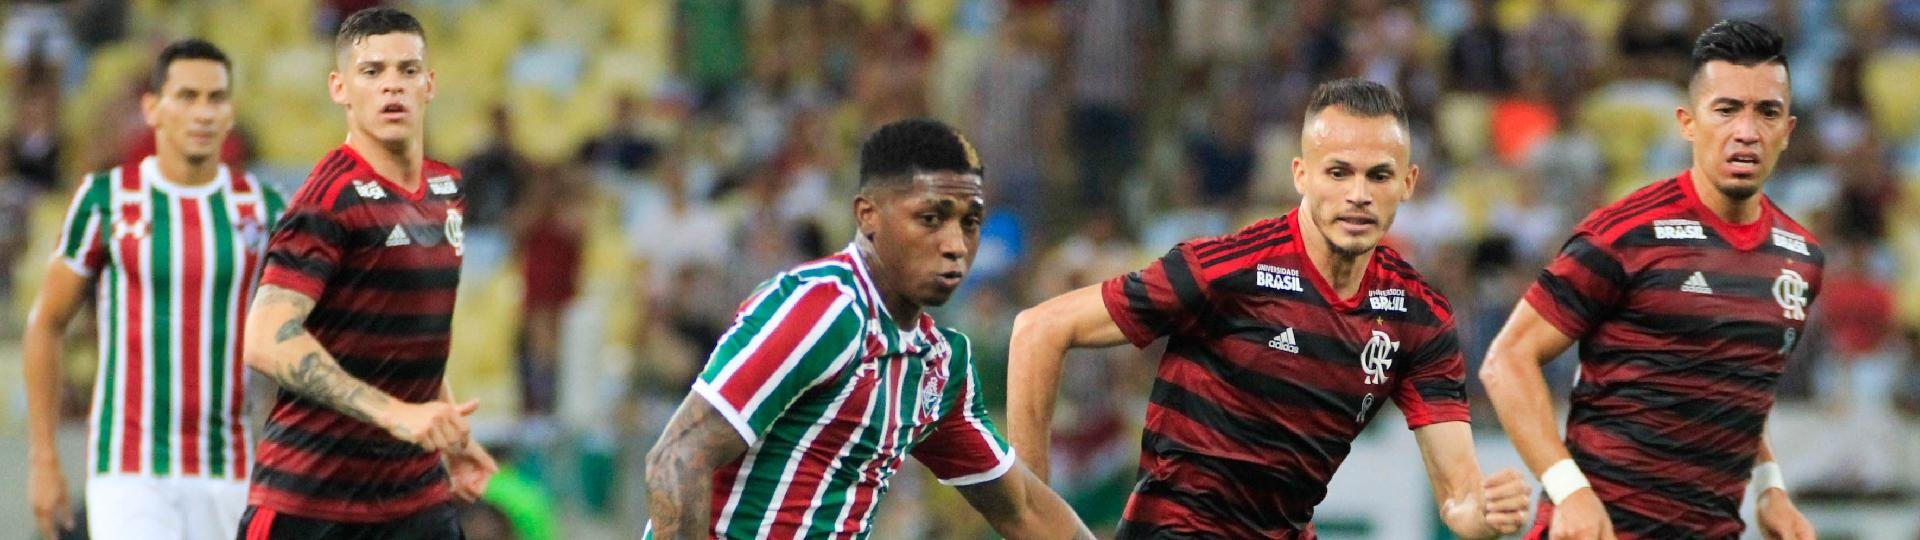 Yony Gonzalez do Fluminense durante partida contra o Flamengo pelo Campeonato Carioca